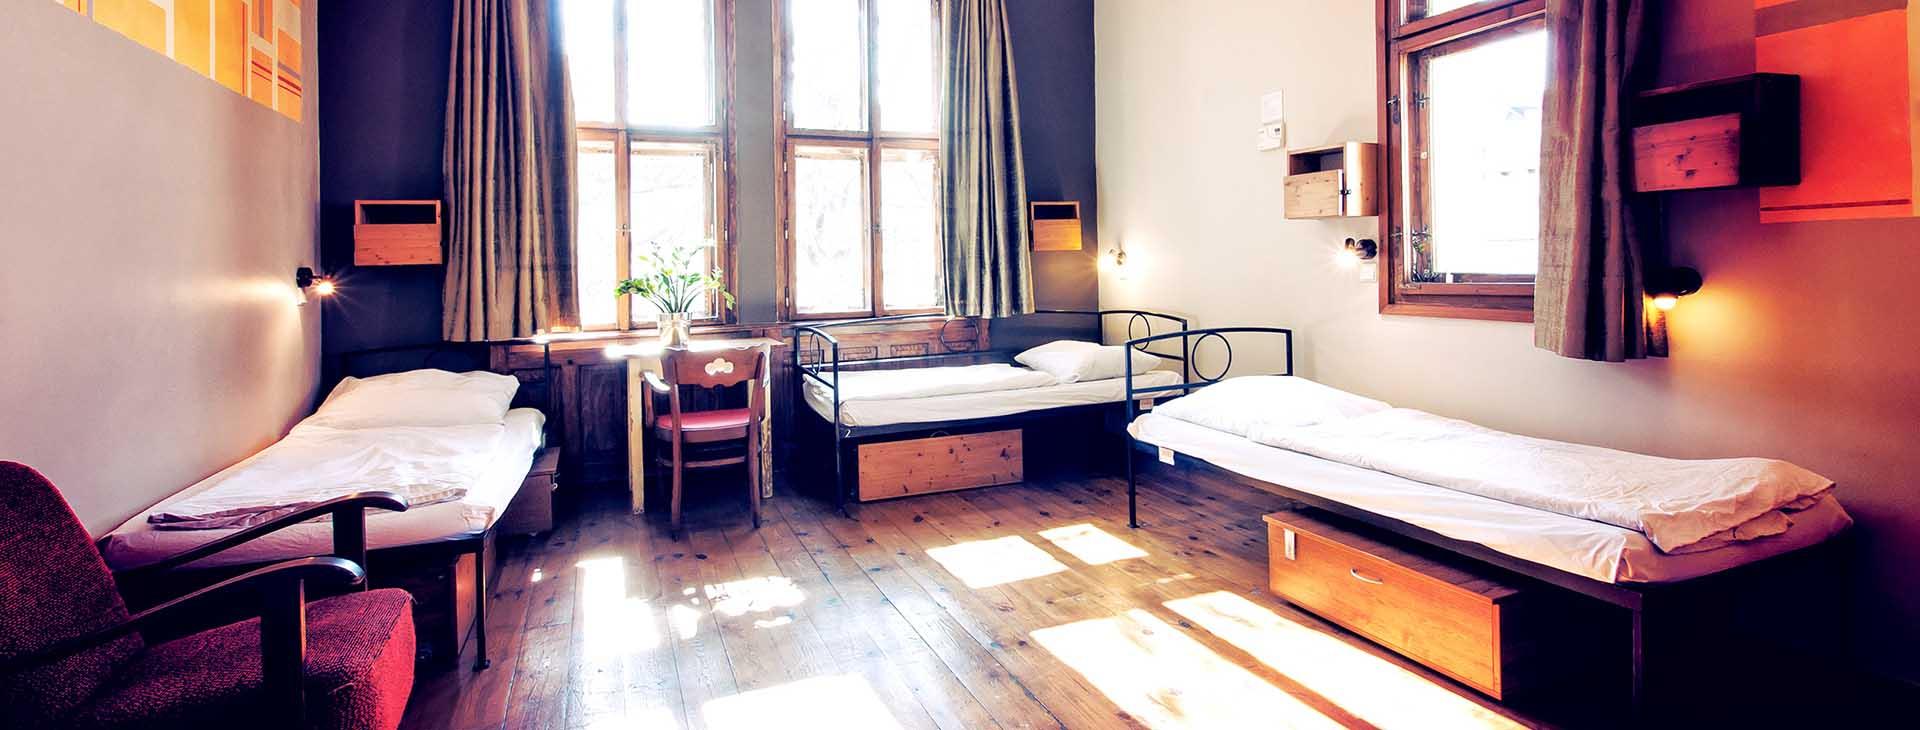 sir-tobys-hostel-prague-dorm-room-1920×730